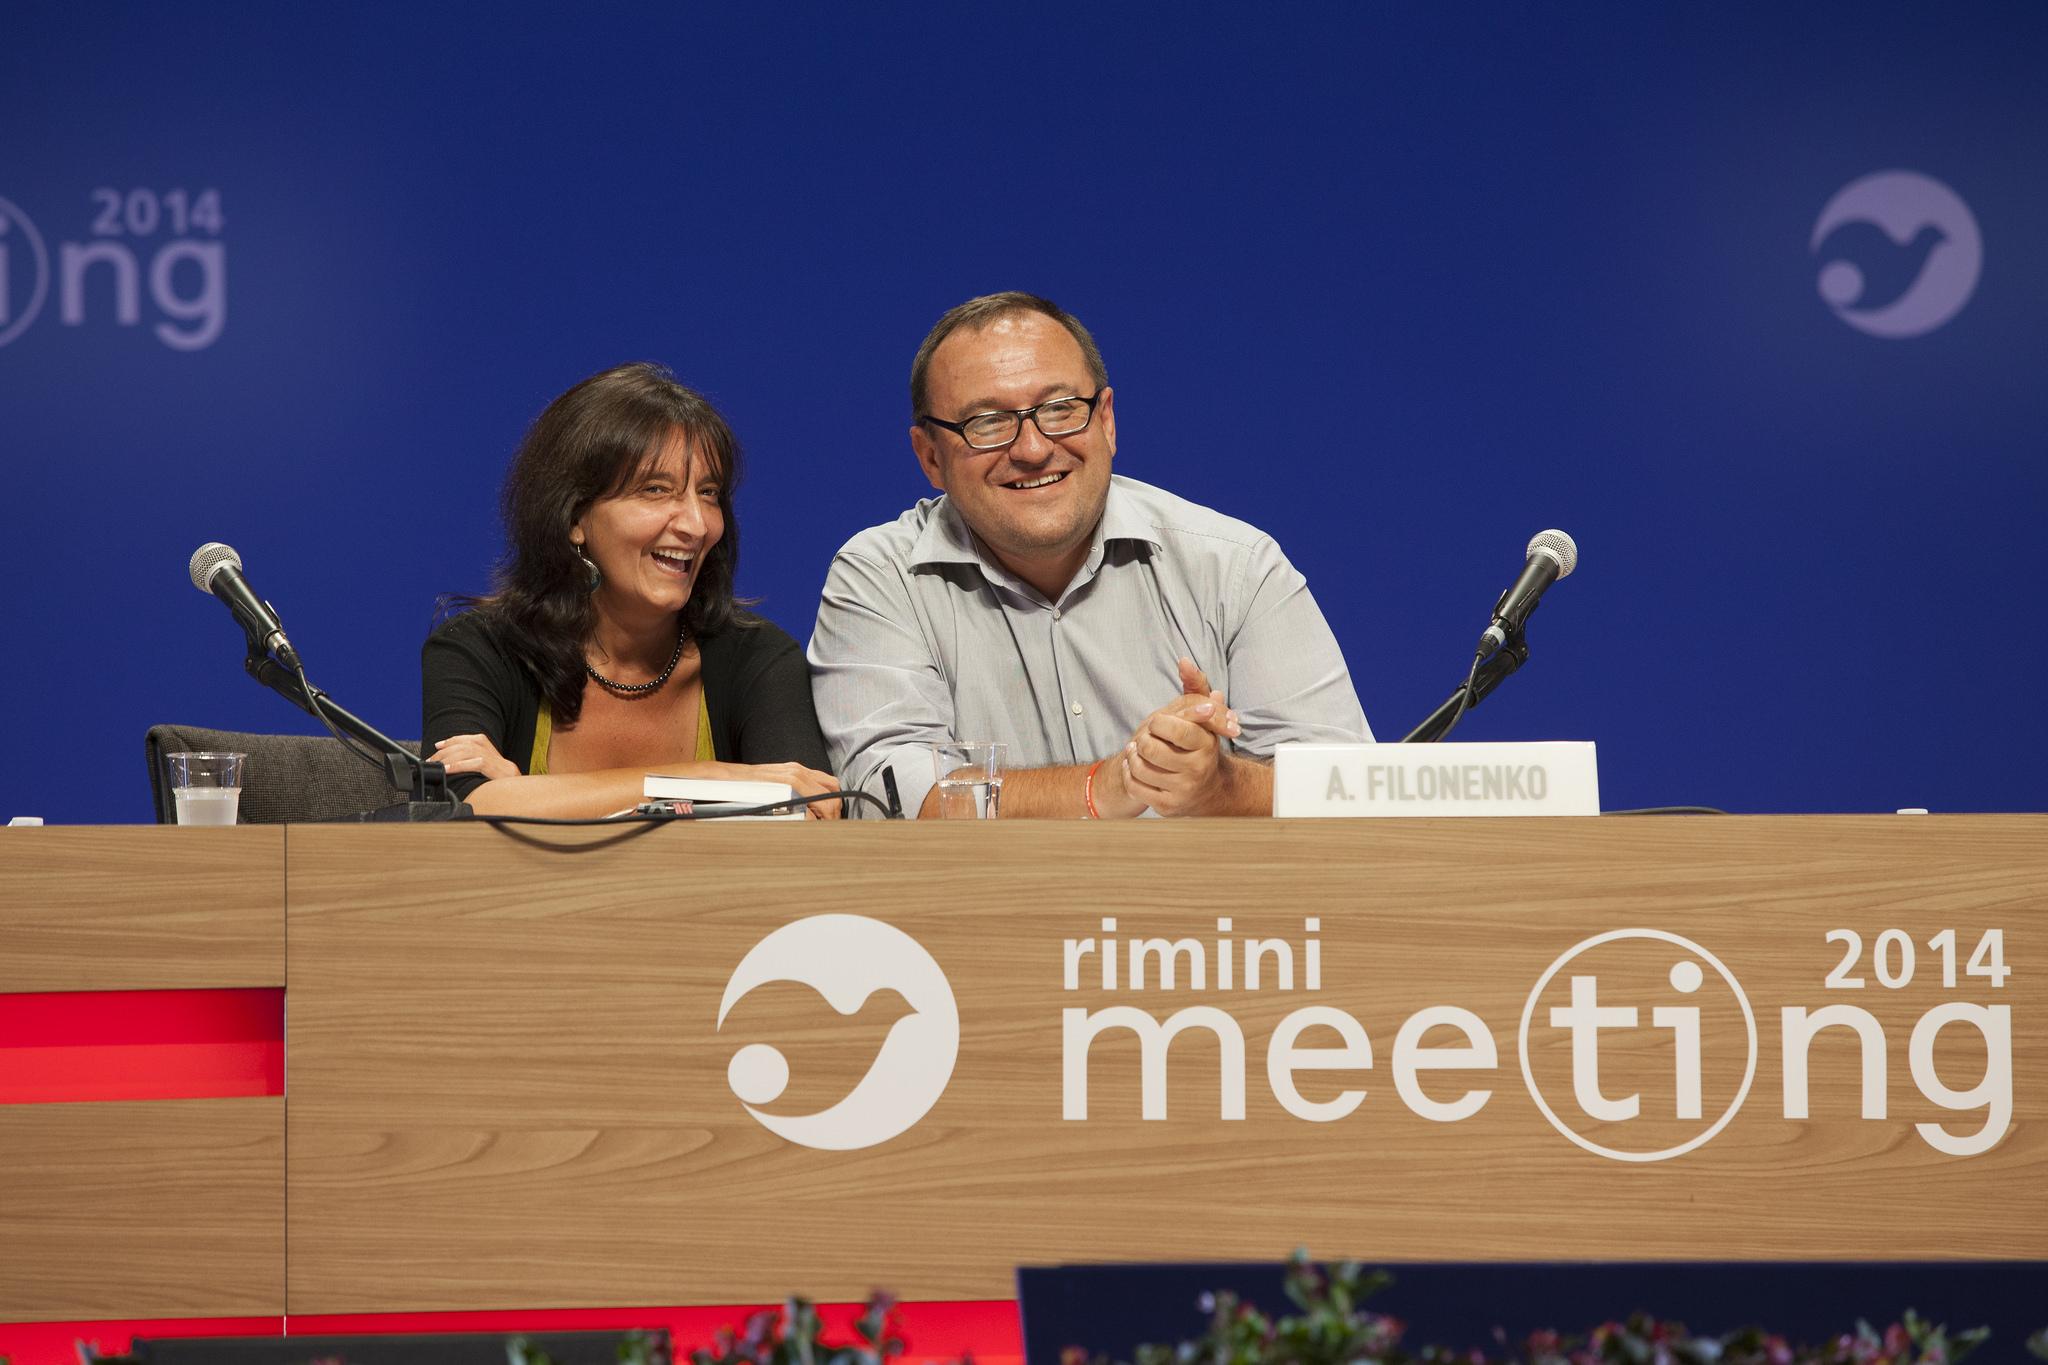 filonenko-meeting-rimini